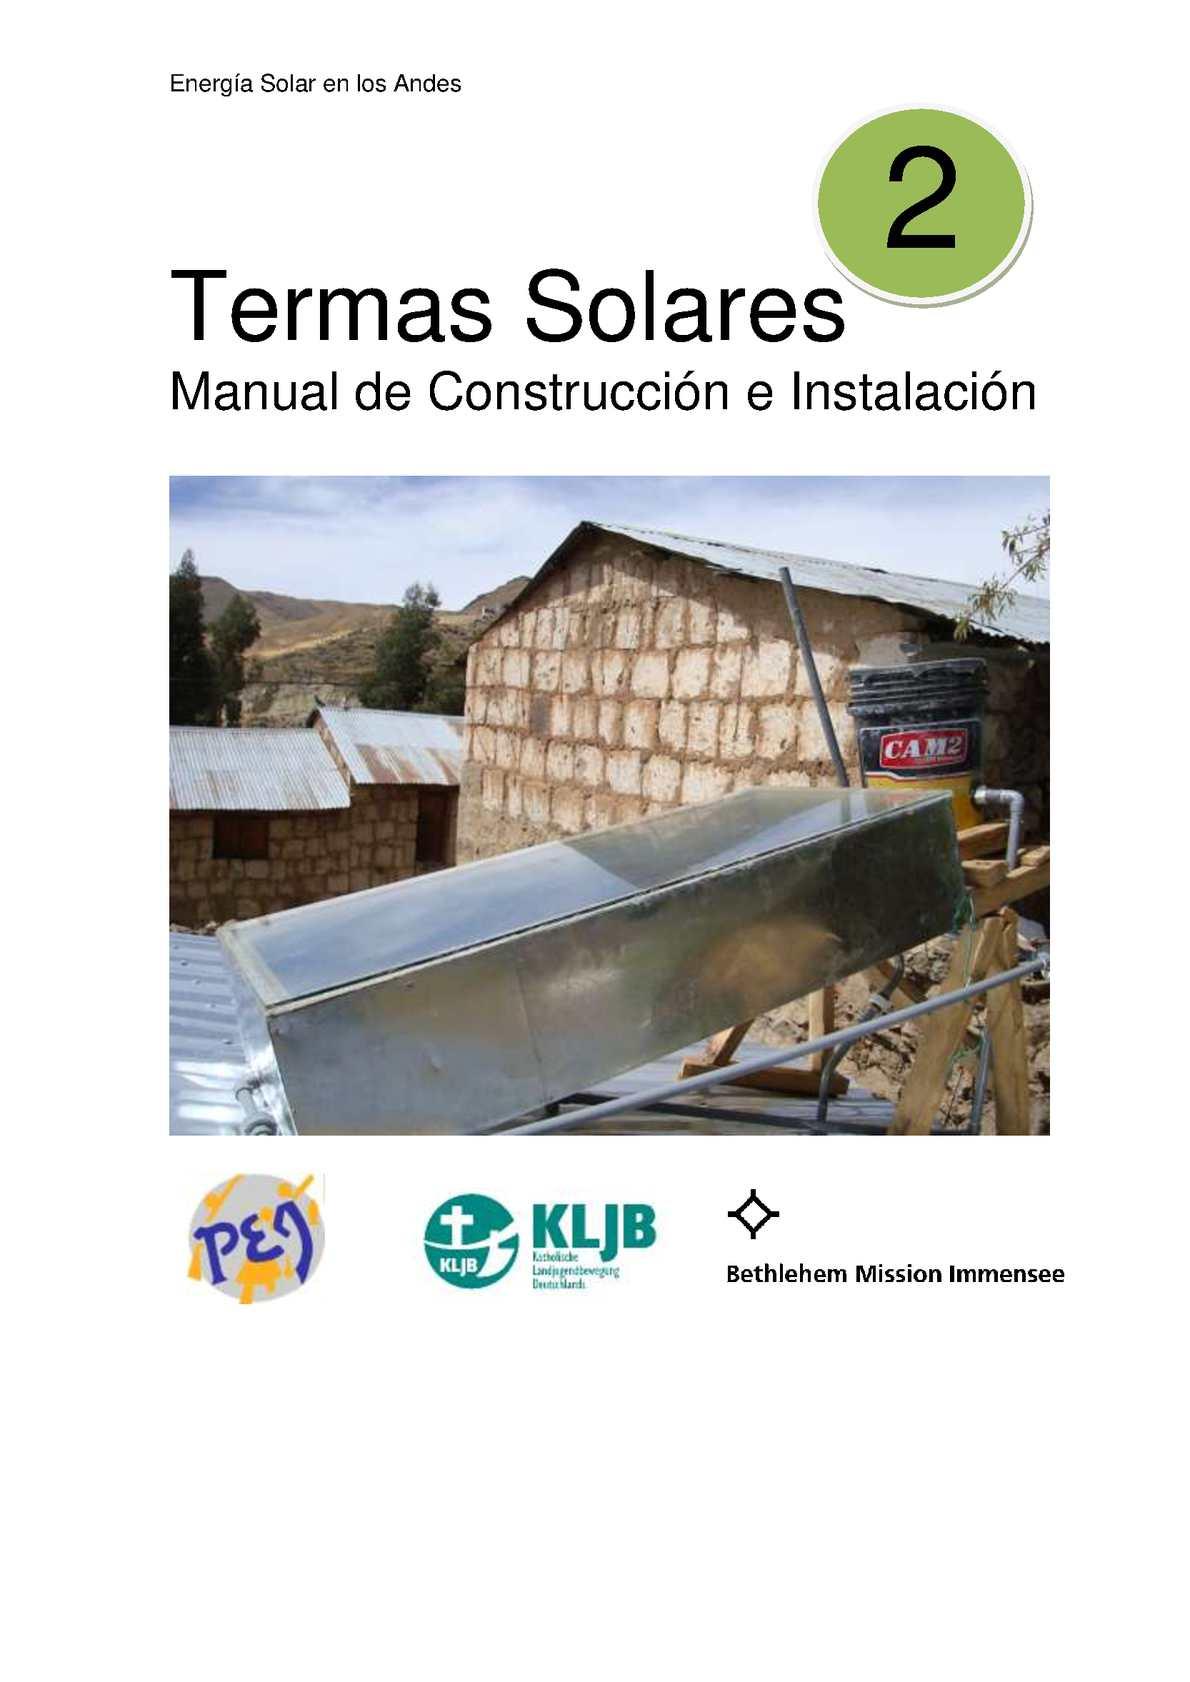 2 Manual Termas Solar